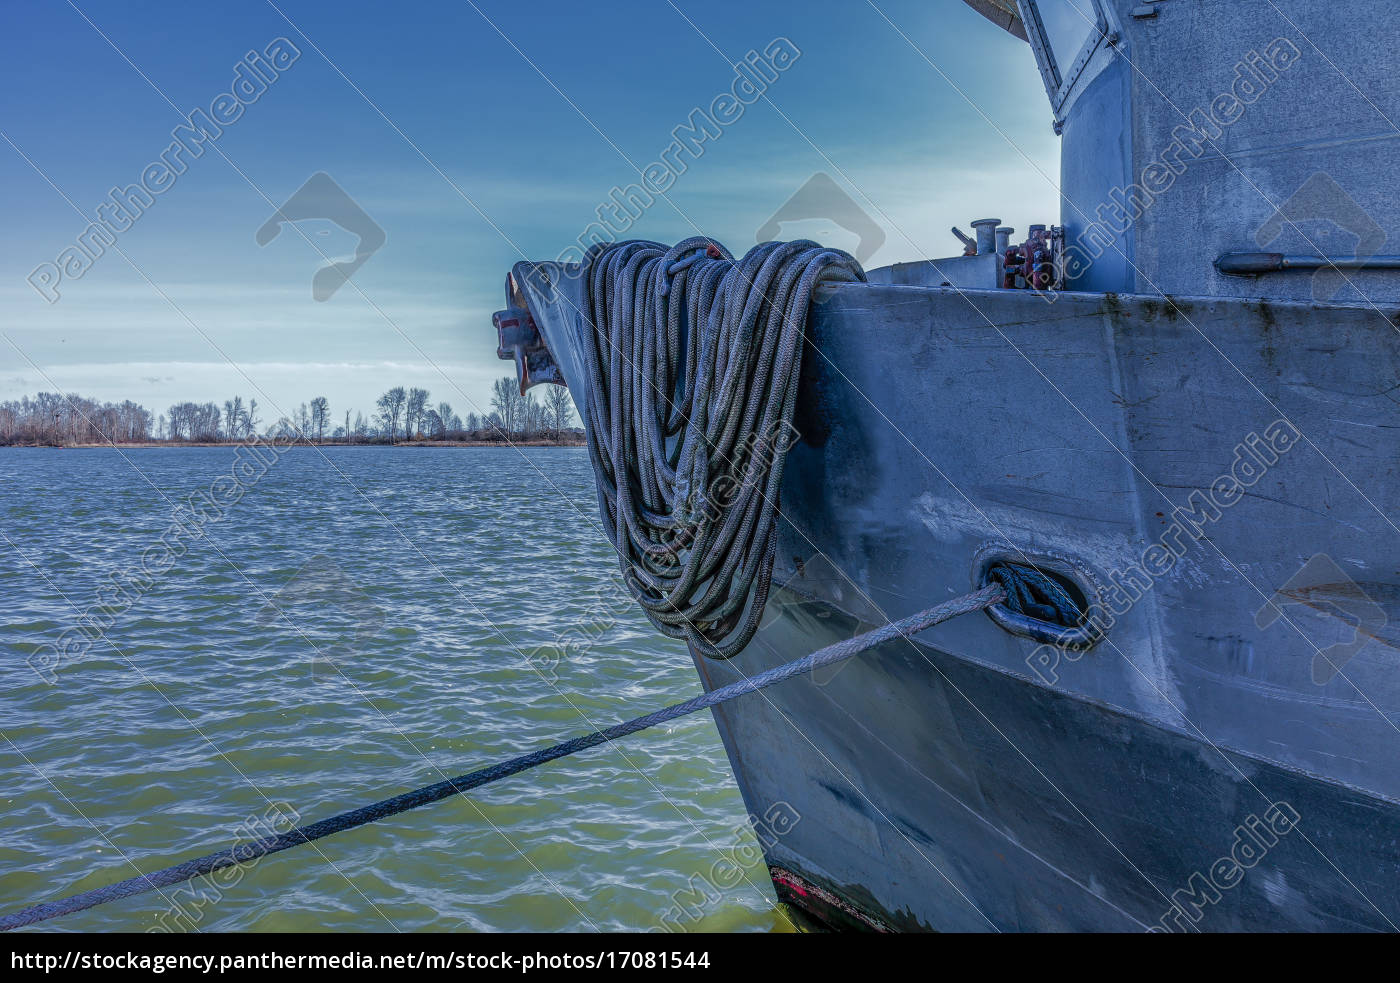 moored, vessel - 17081544